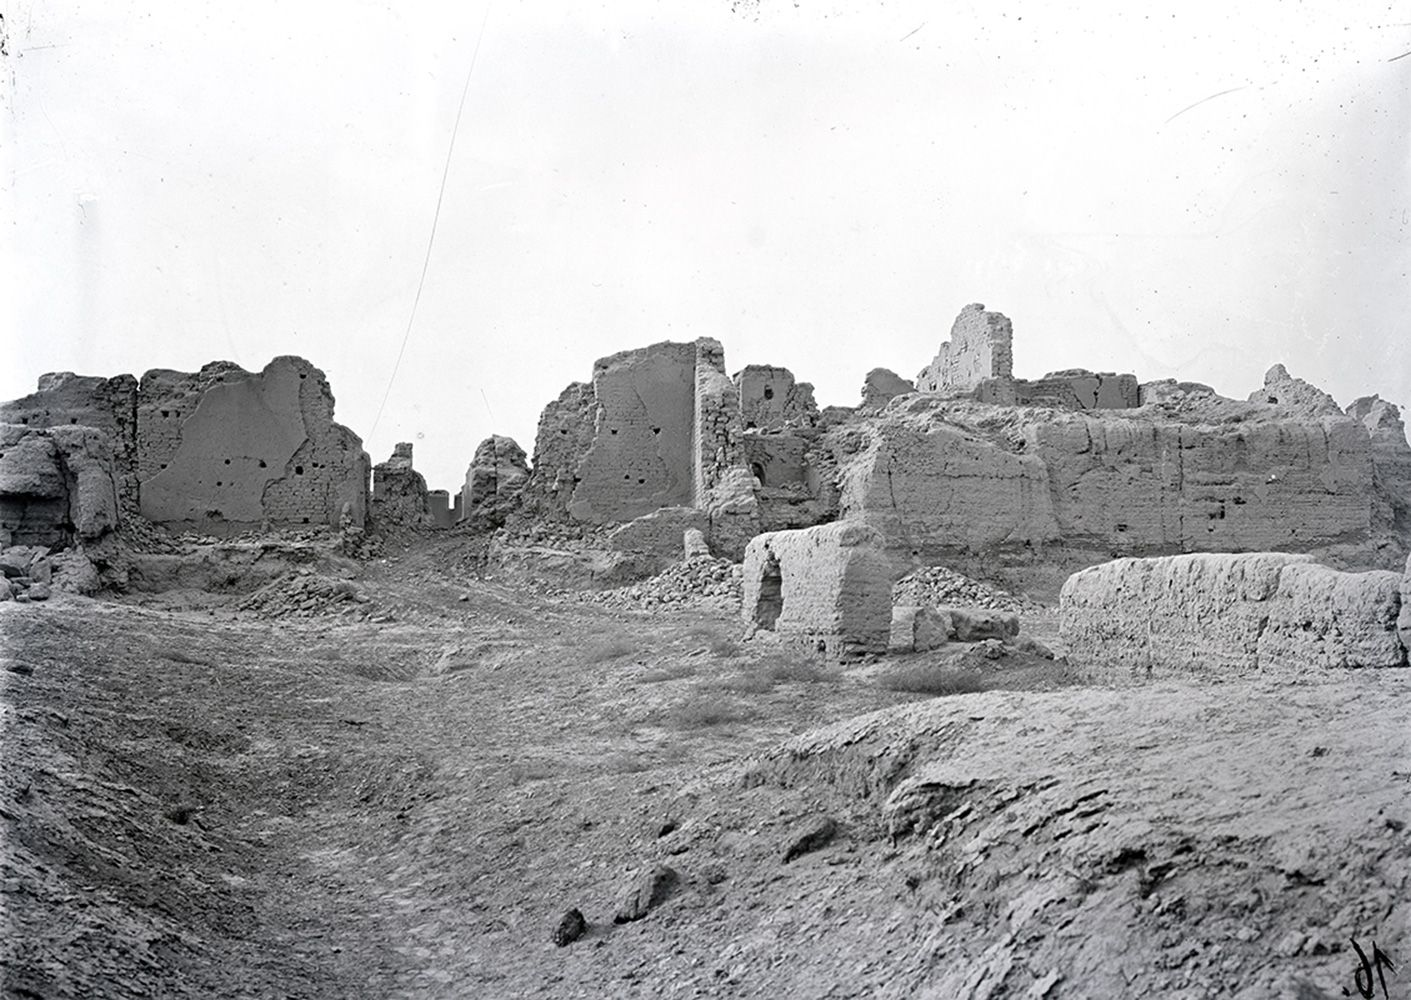 Kloster Beta in der Ruinenstadt Kočo, Foto: Anfang 20. Jh. © Staatliche Museen zu Berlin, Museum für Asiatische Kunst